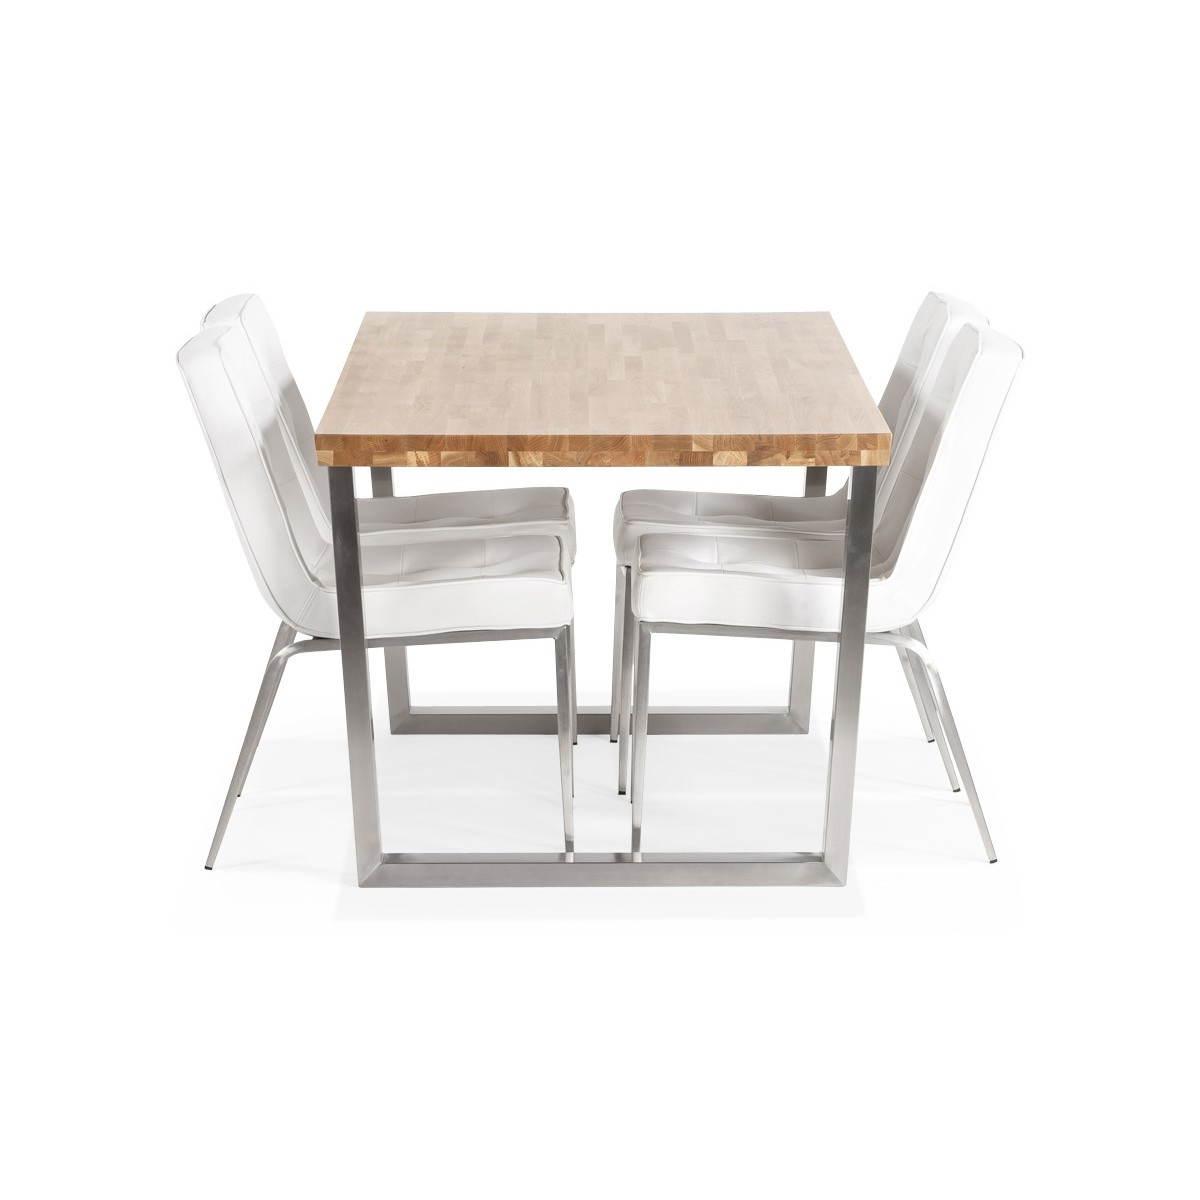 #8B6140 Table Moderne Rectangulaire PANOU En Chêne Massif (bois  4041 table salle a manger chene massif rectangulaire 1200x1200 px @ aertt.com